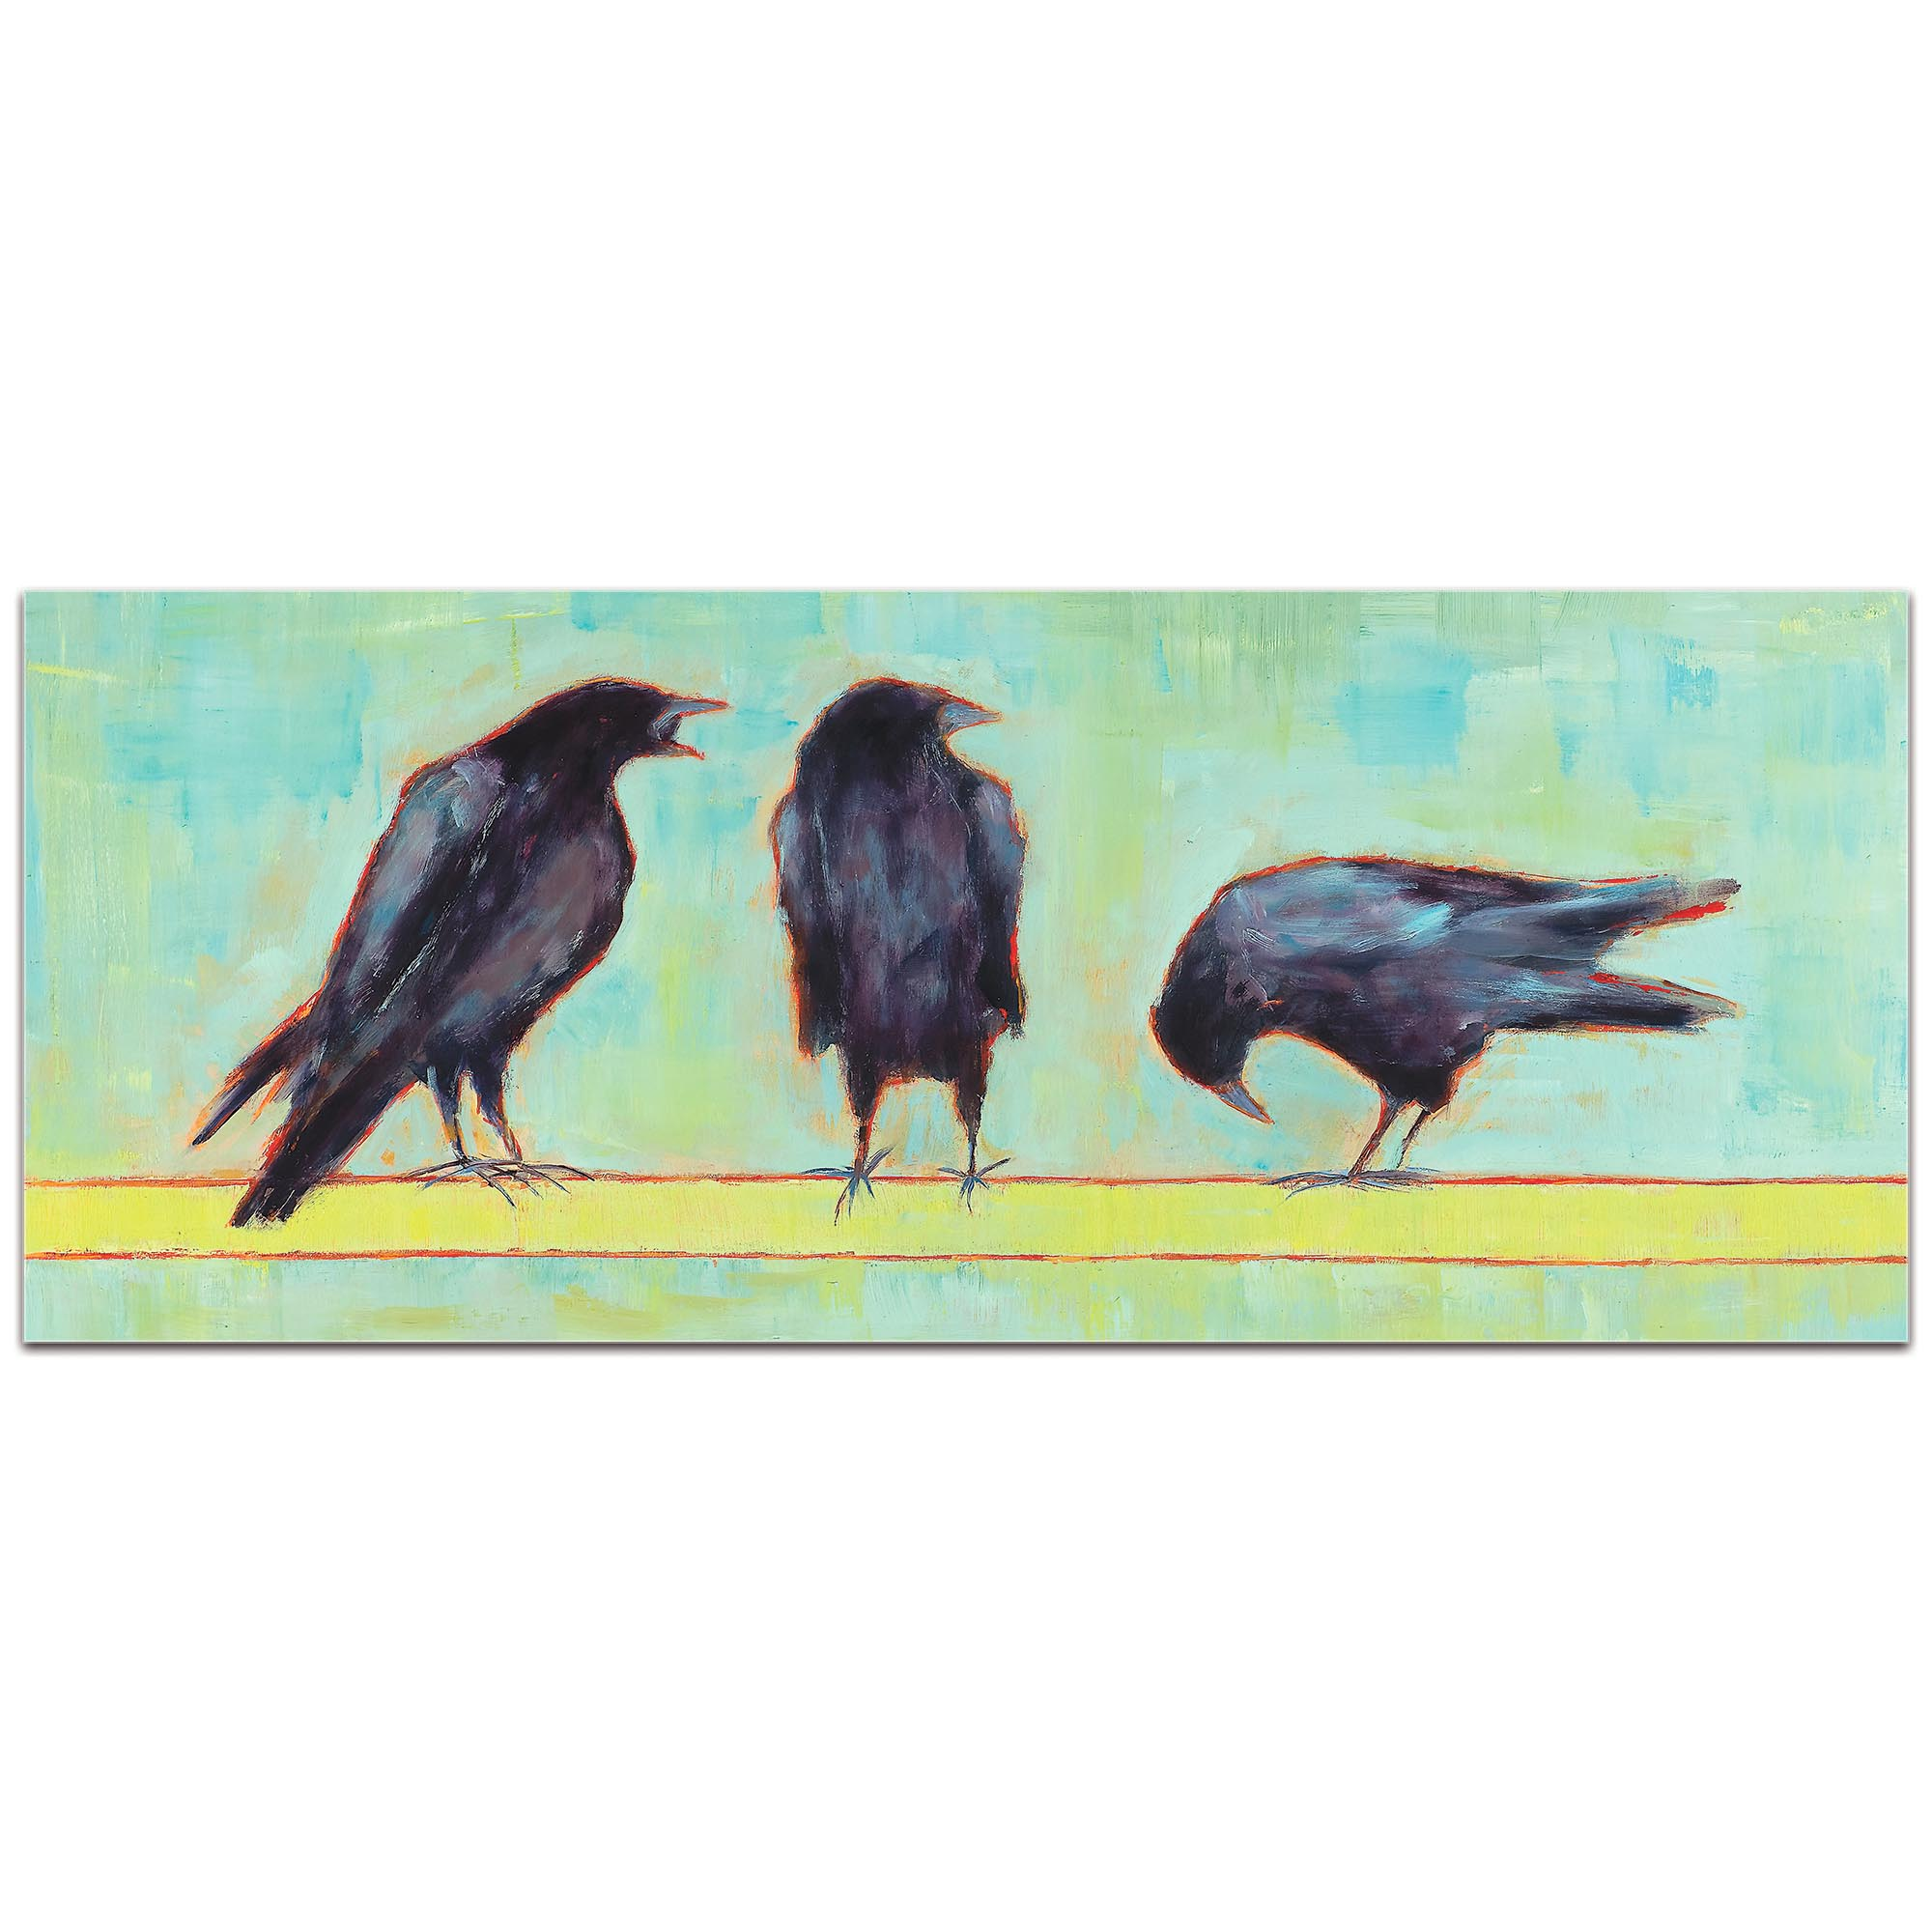 Contemporary Wall Art 'Crow Bar 1 v2' - Urban Birds Decor on Metal or Plexiglass - Image 2